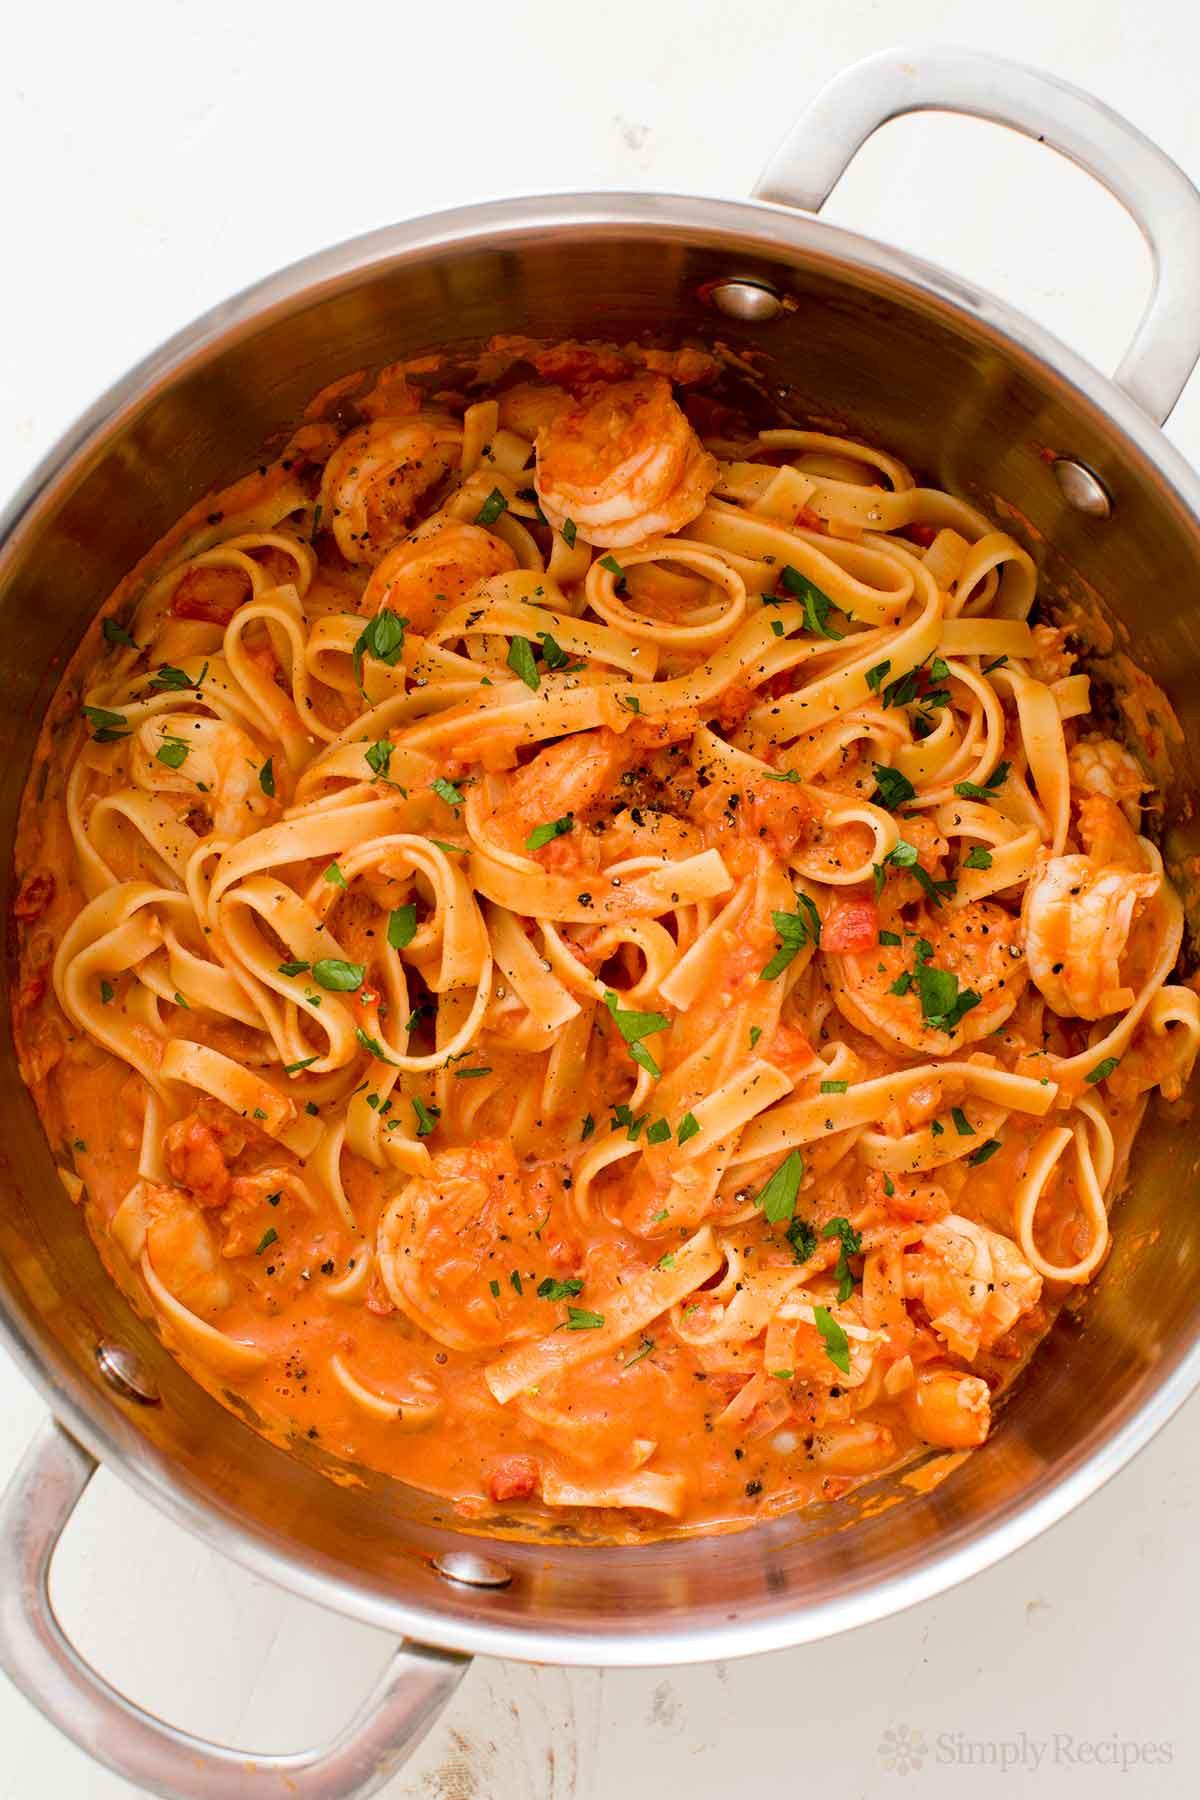 Shrimp Recipes With Pasta  Shrimp Pasta alla Vodka Recipe with video